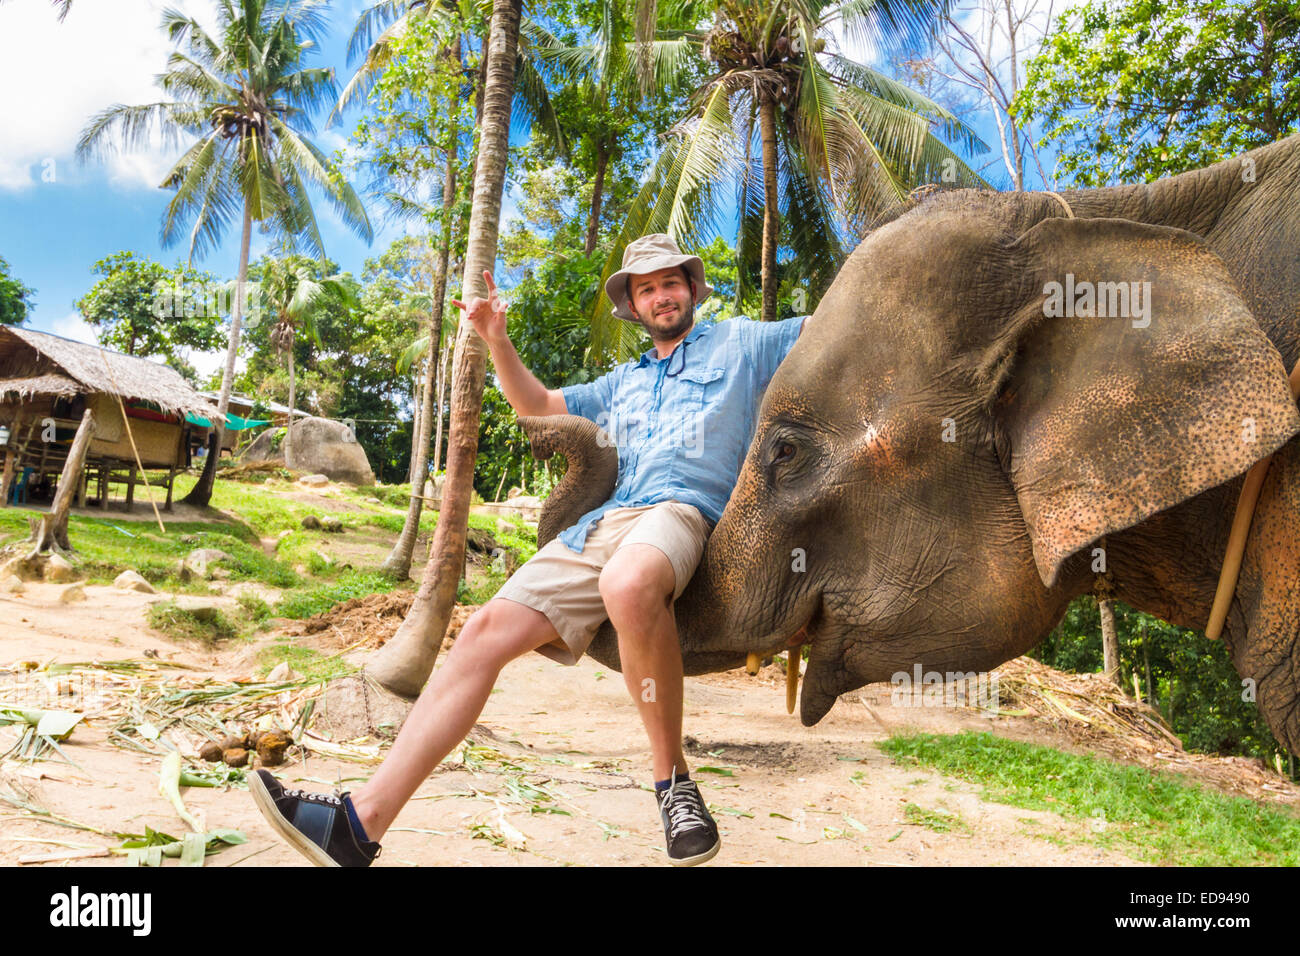 Elephan levage d'une touriste. Photo Stock